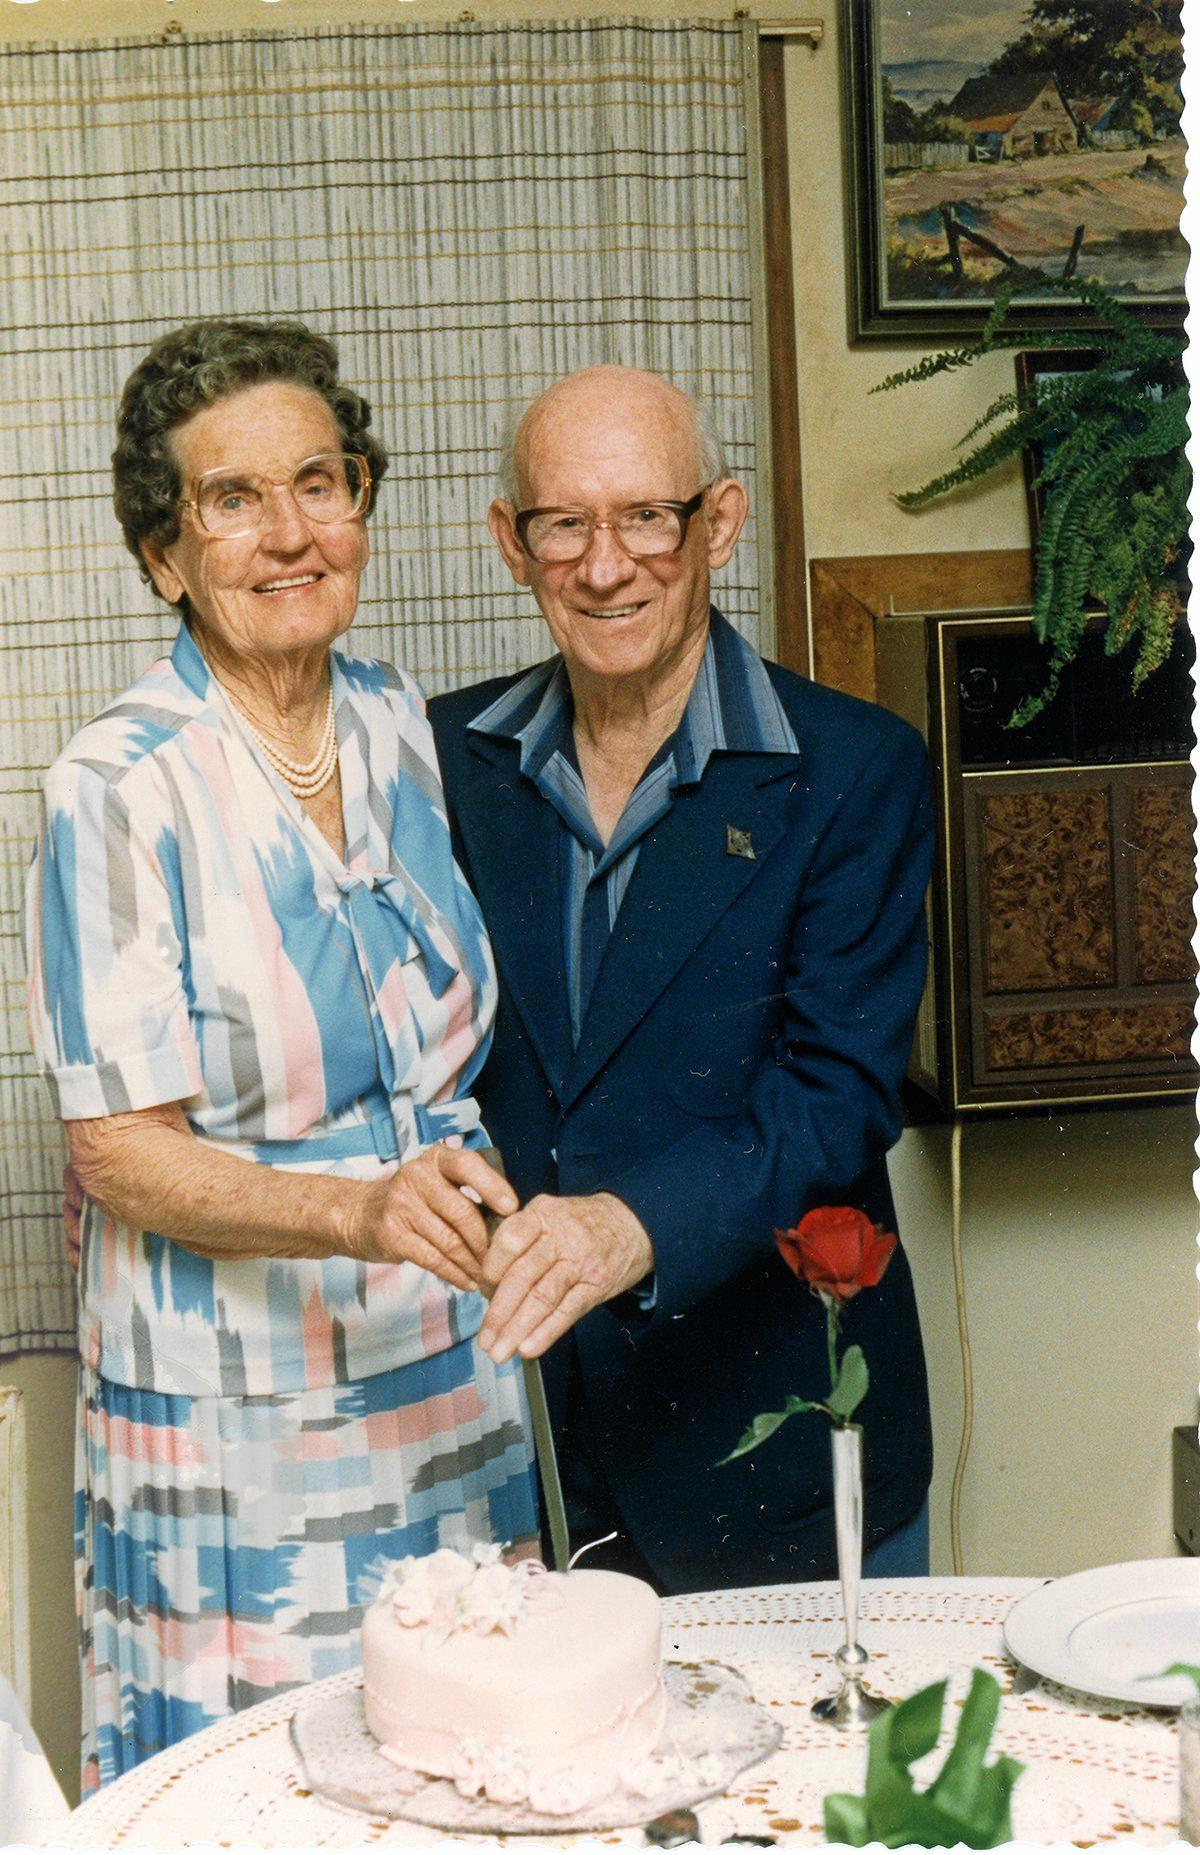 Ella and Lionel Mitchell cut the cake on their diamond wedding anniversary, 1987.